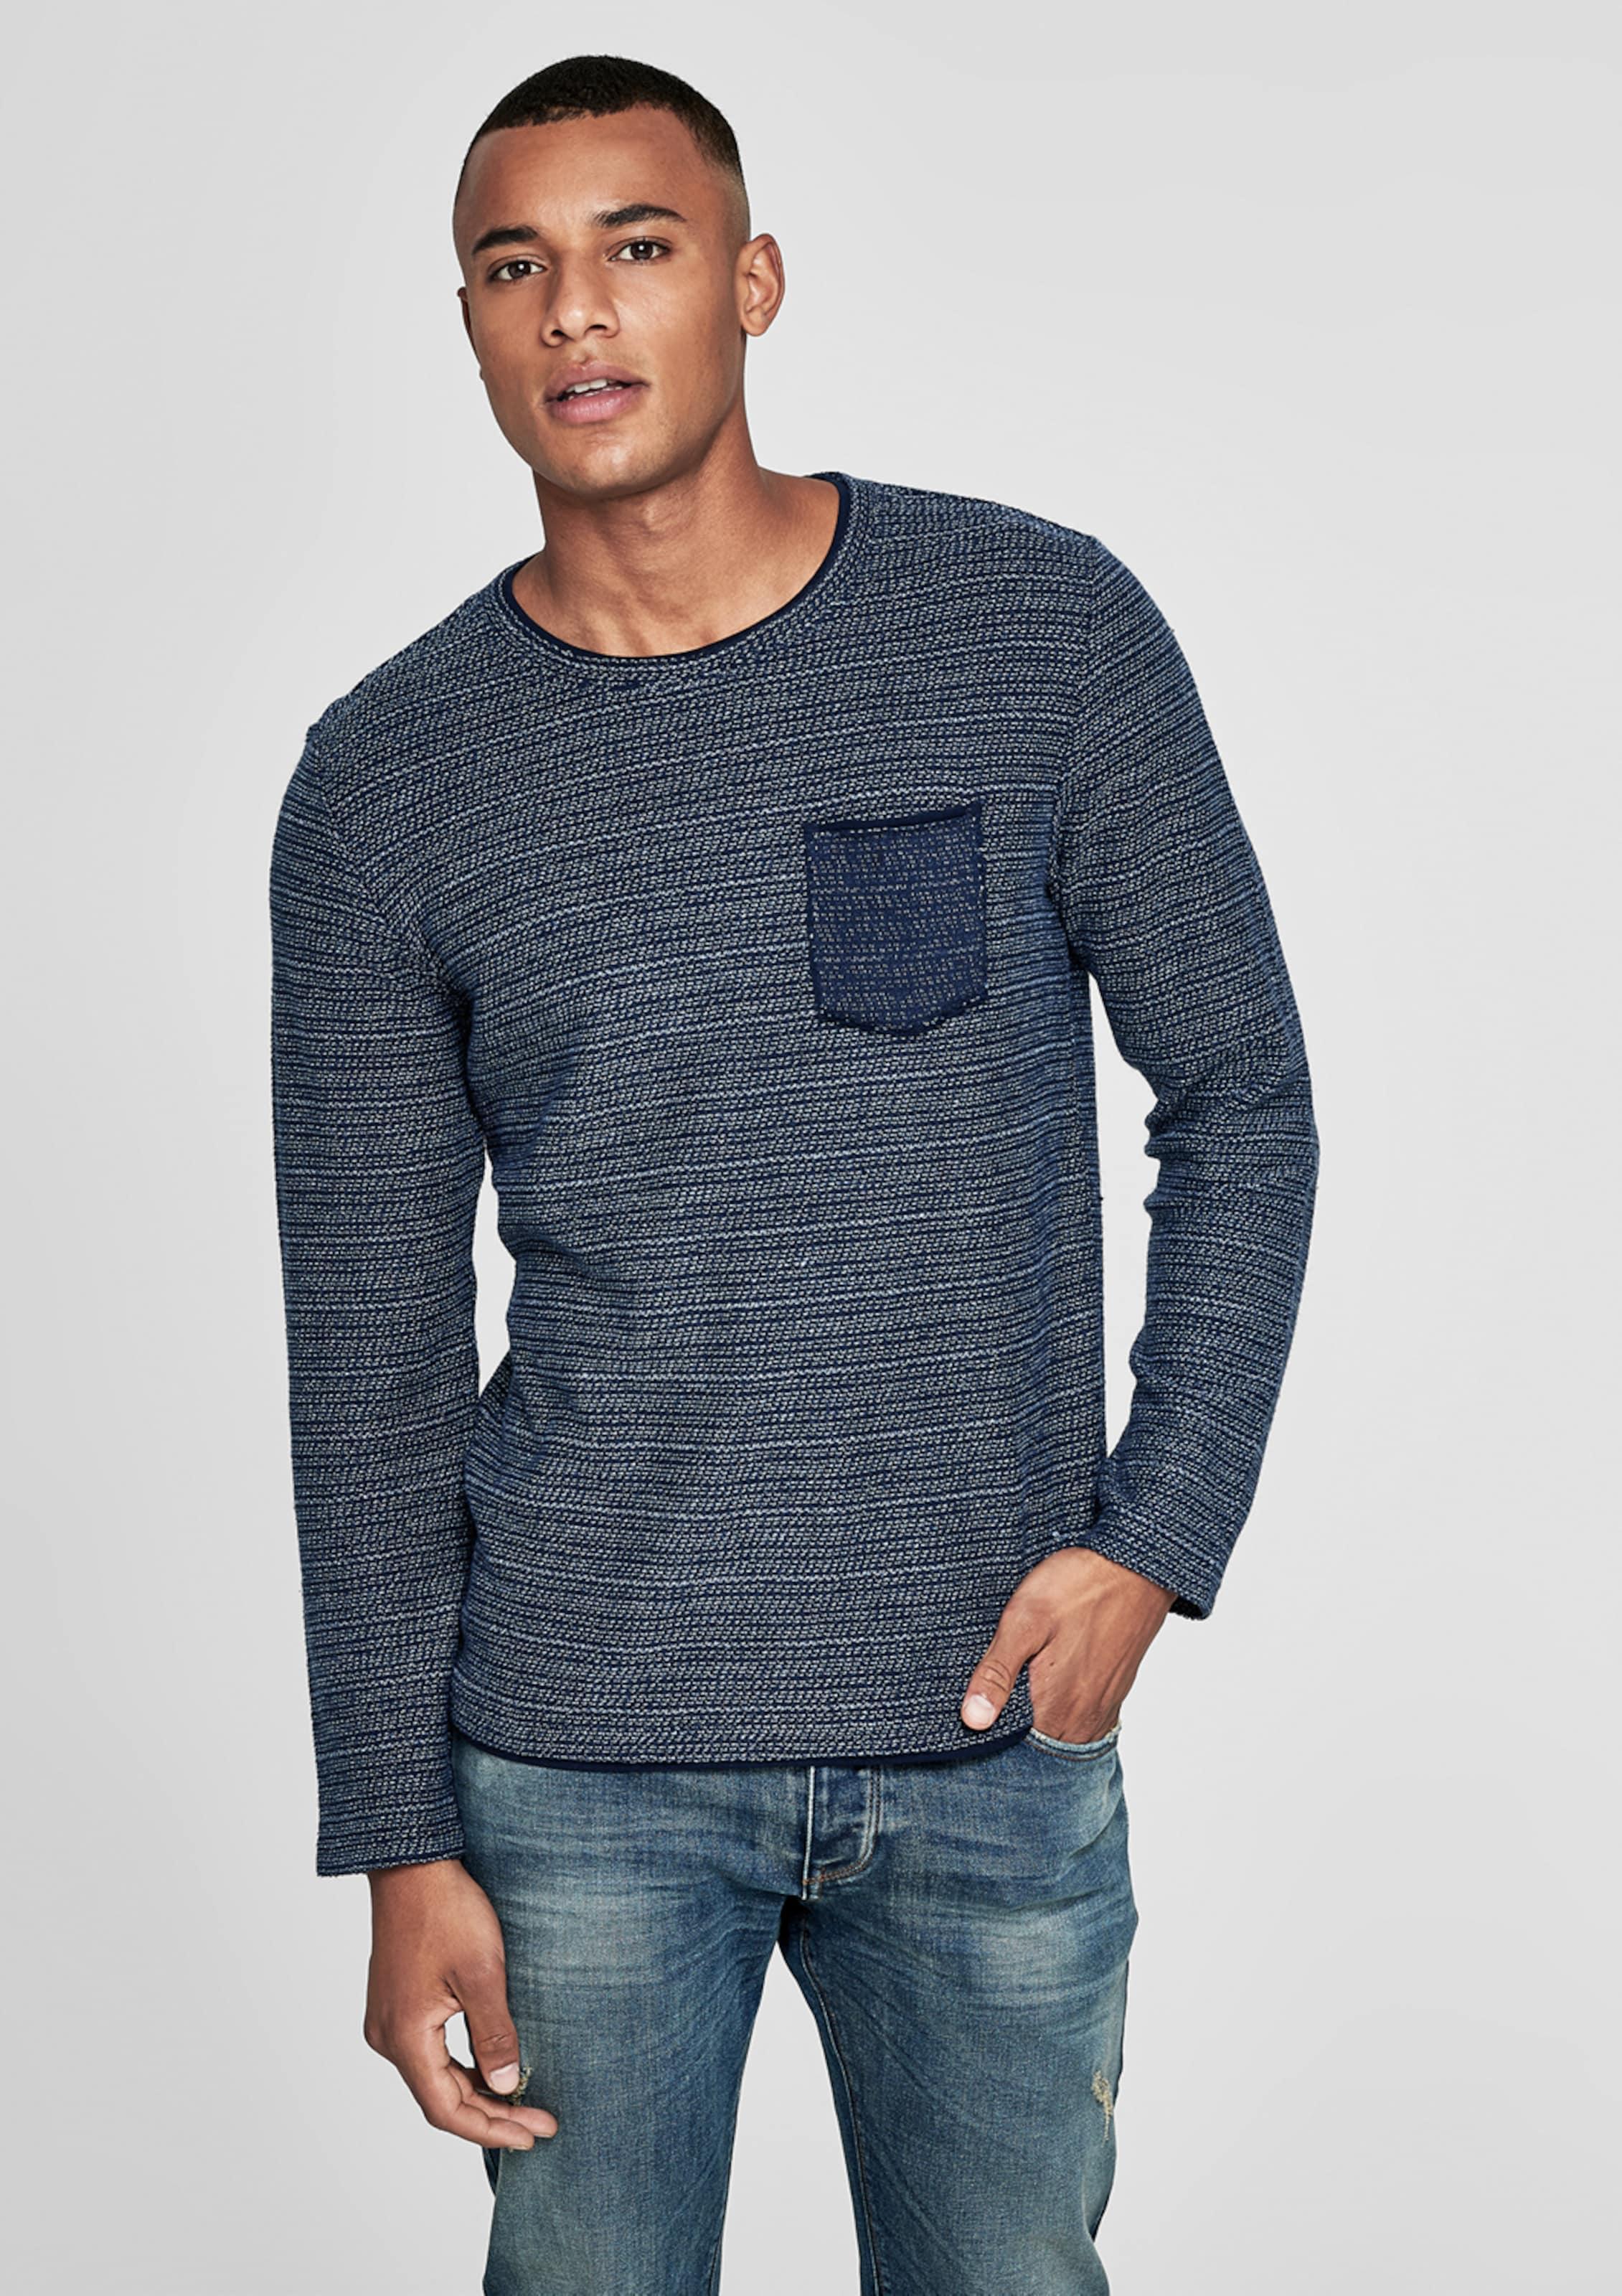 s Sweatshirt Q Dunkelblau Designed By In rxBCdEoeWQ